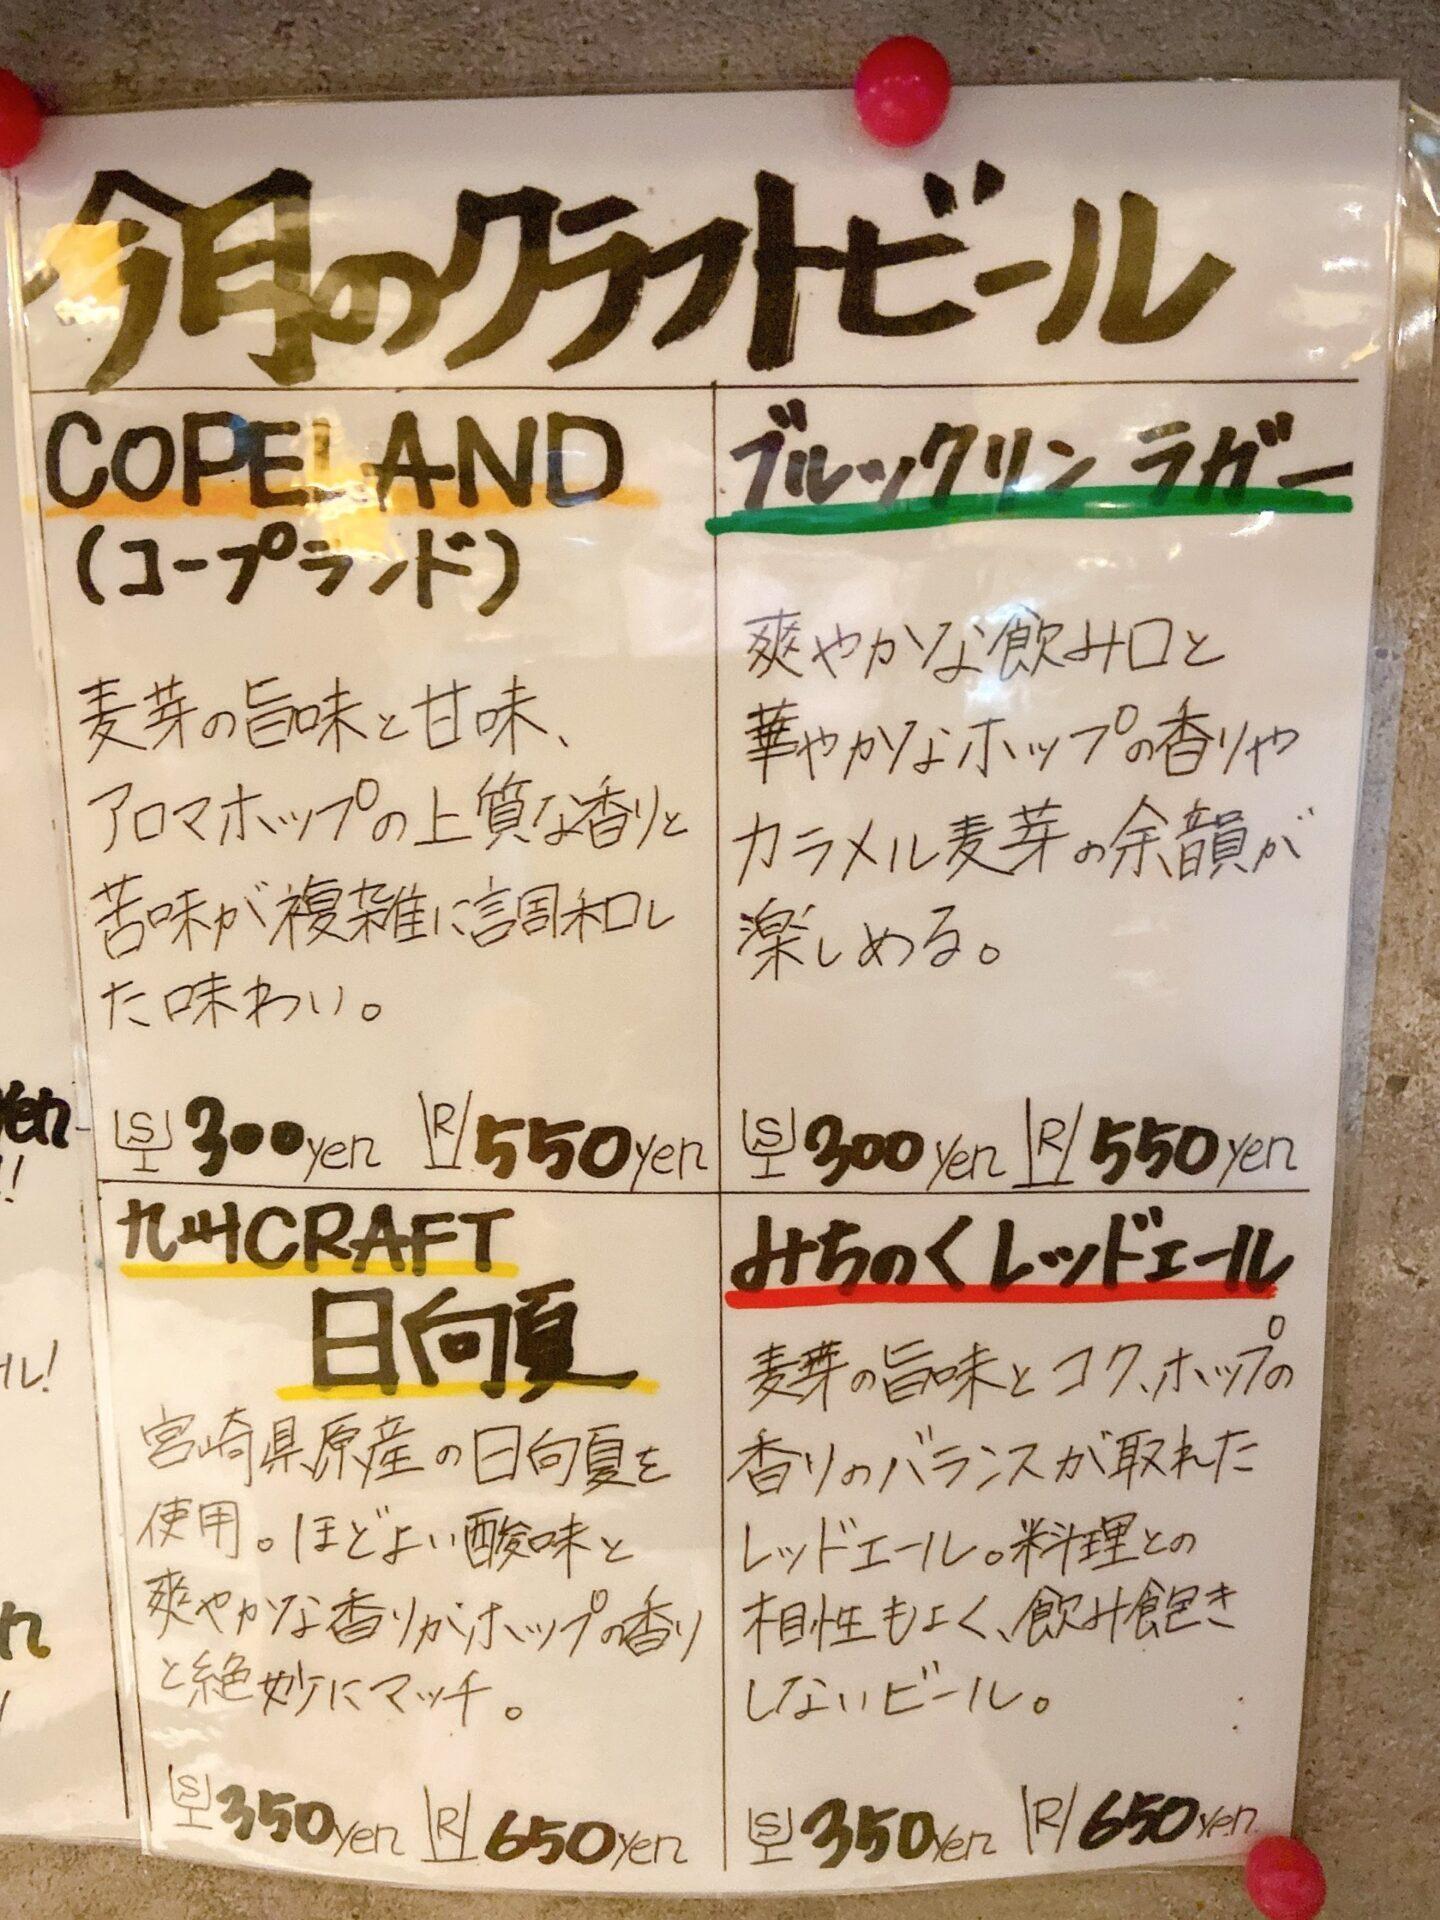 Emisai クラフトビール